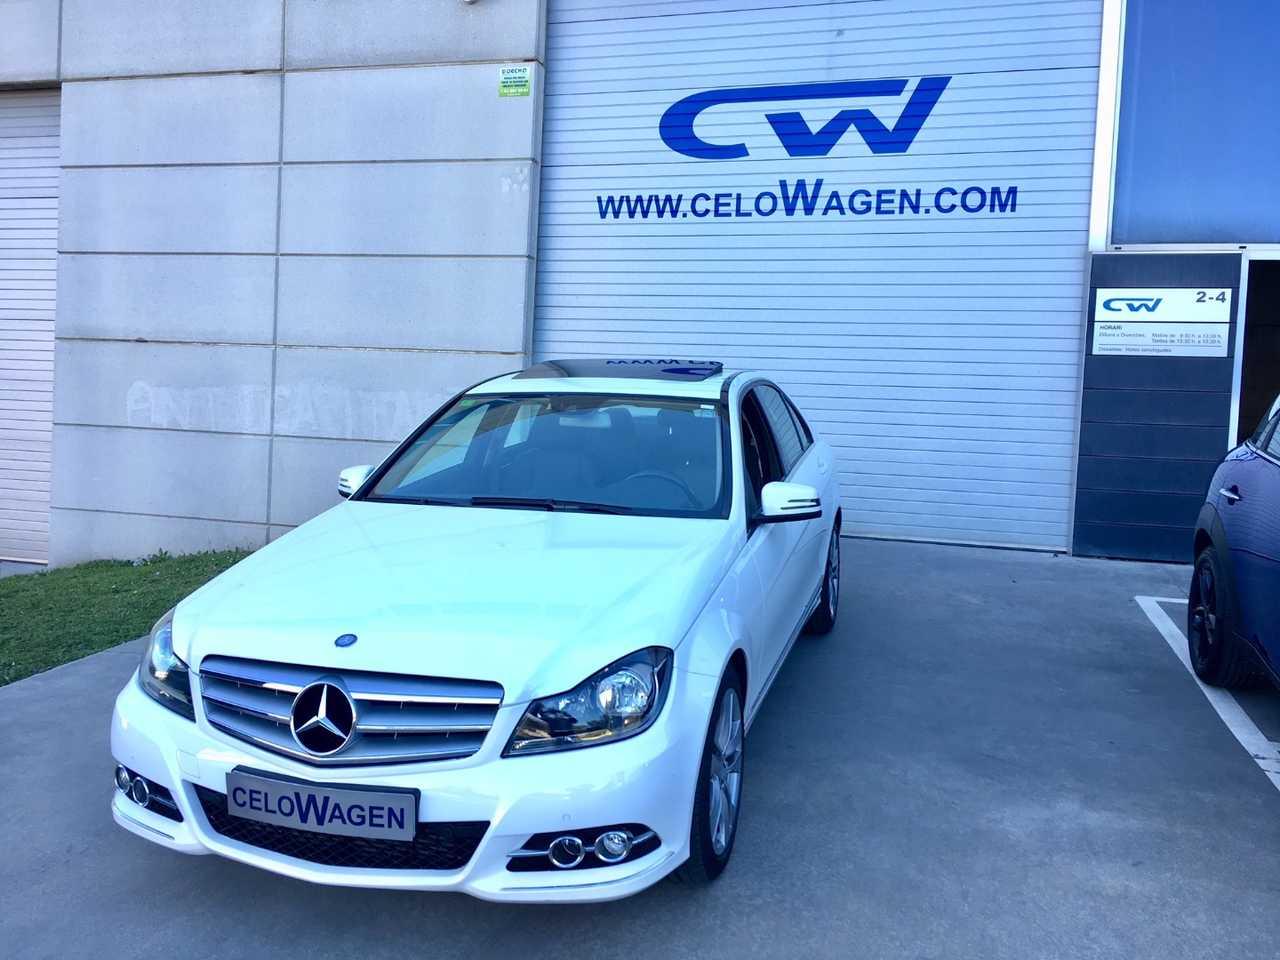 Mercedes Clase C 220 cdi Blue Efficiency Avangarde Aut   - Foto 1